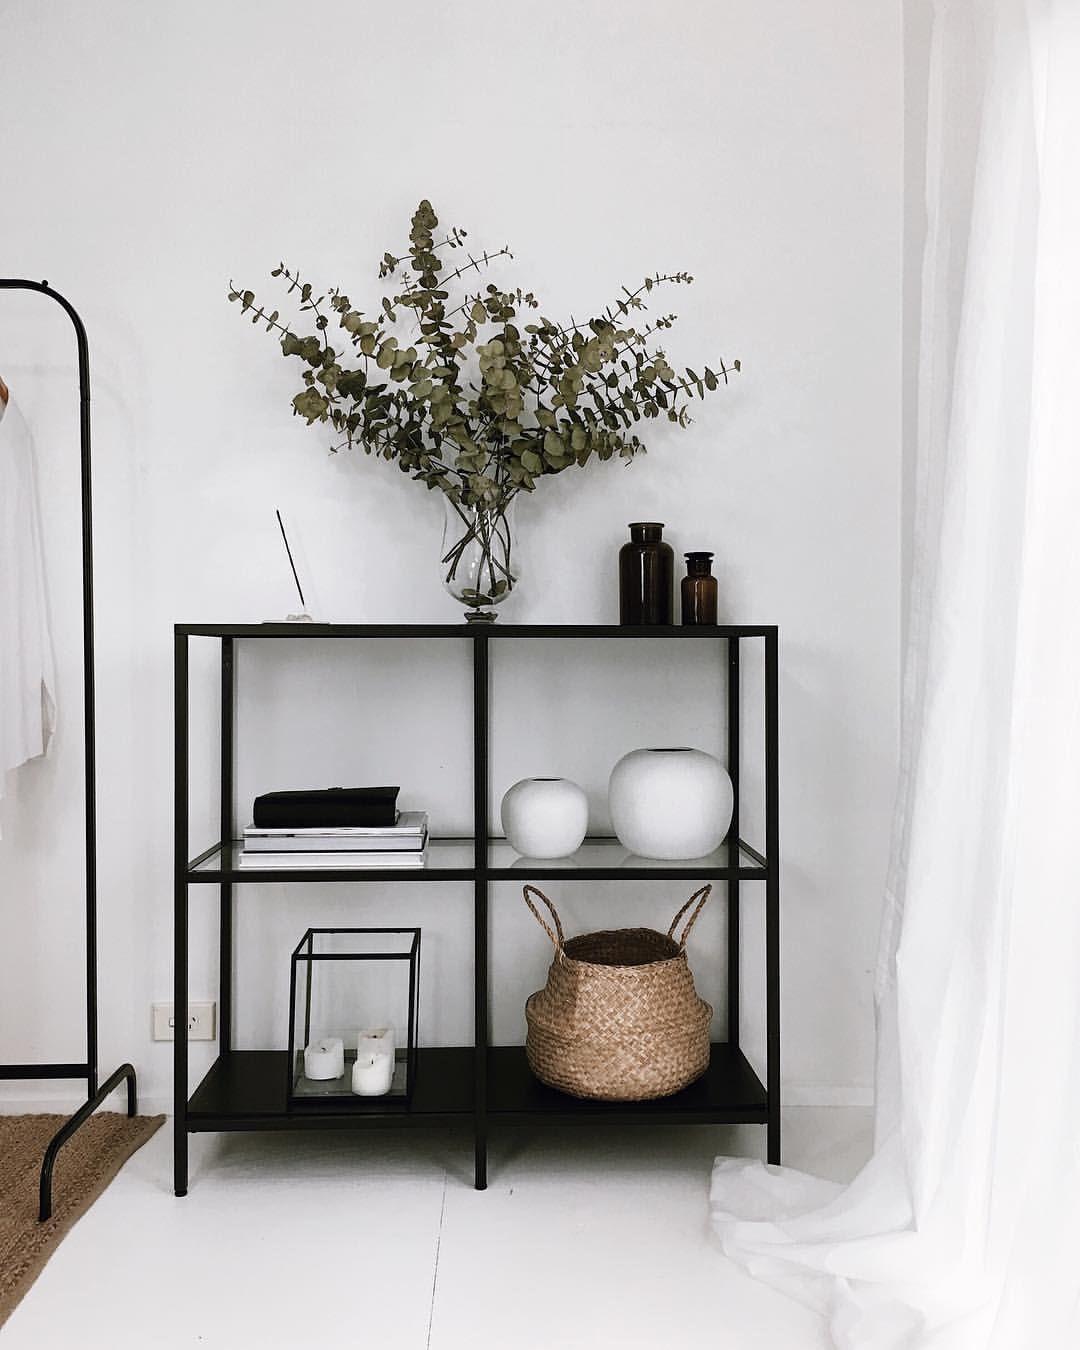 Ikea shelf. | Living room inspiration, Decorate your room ...